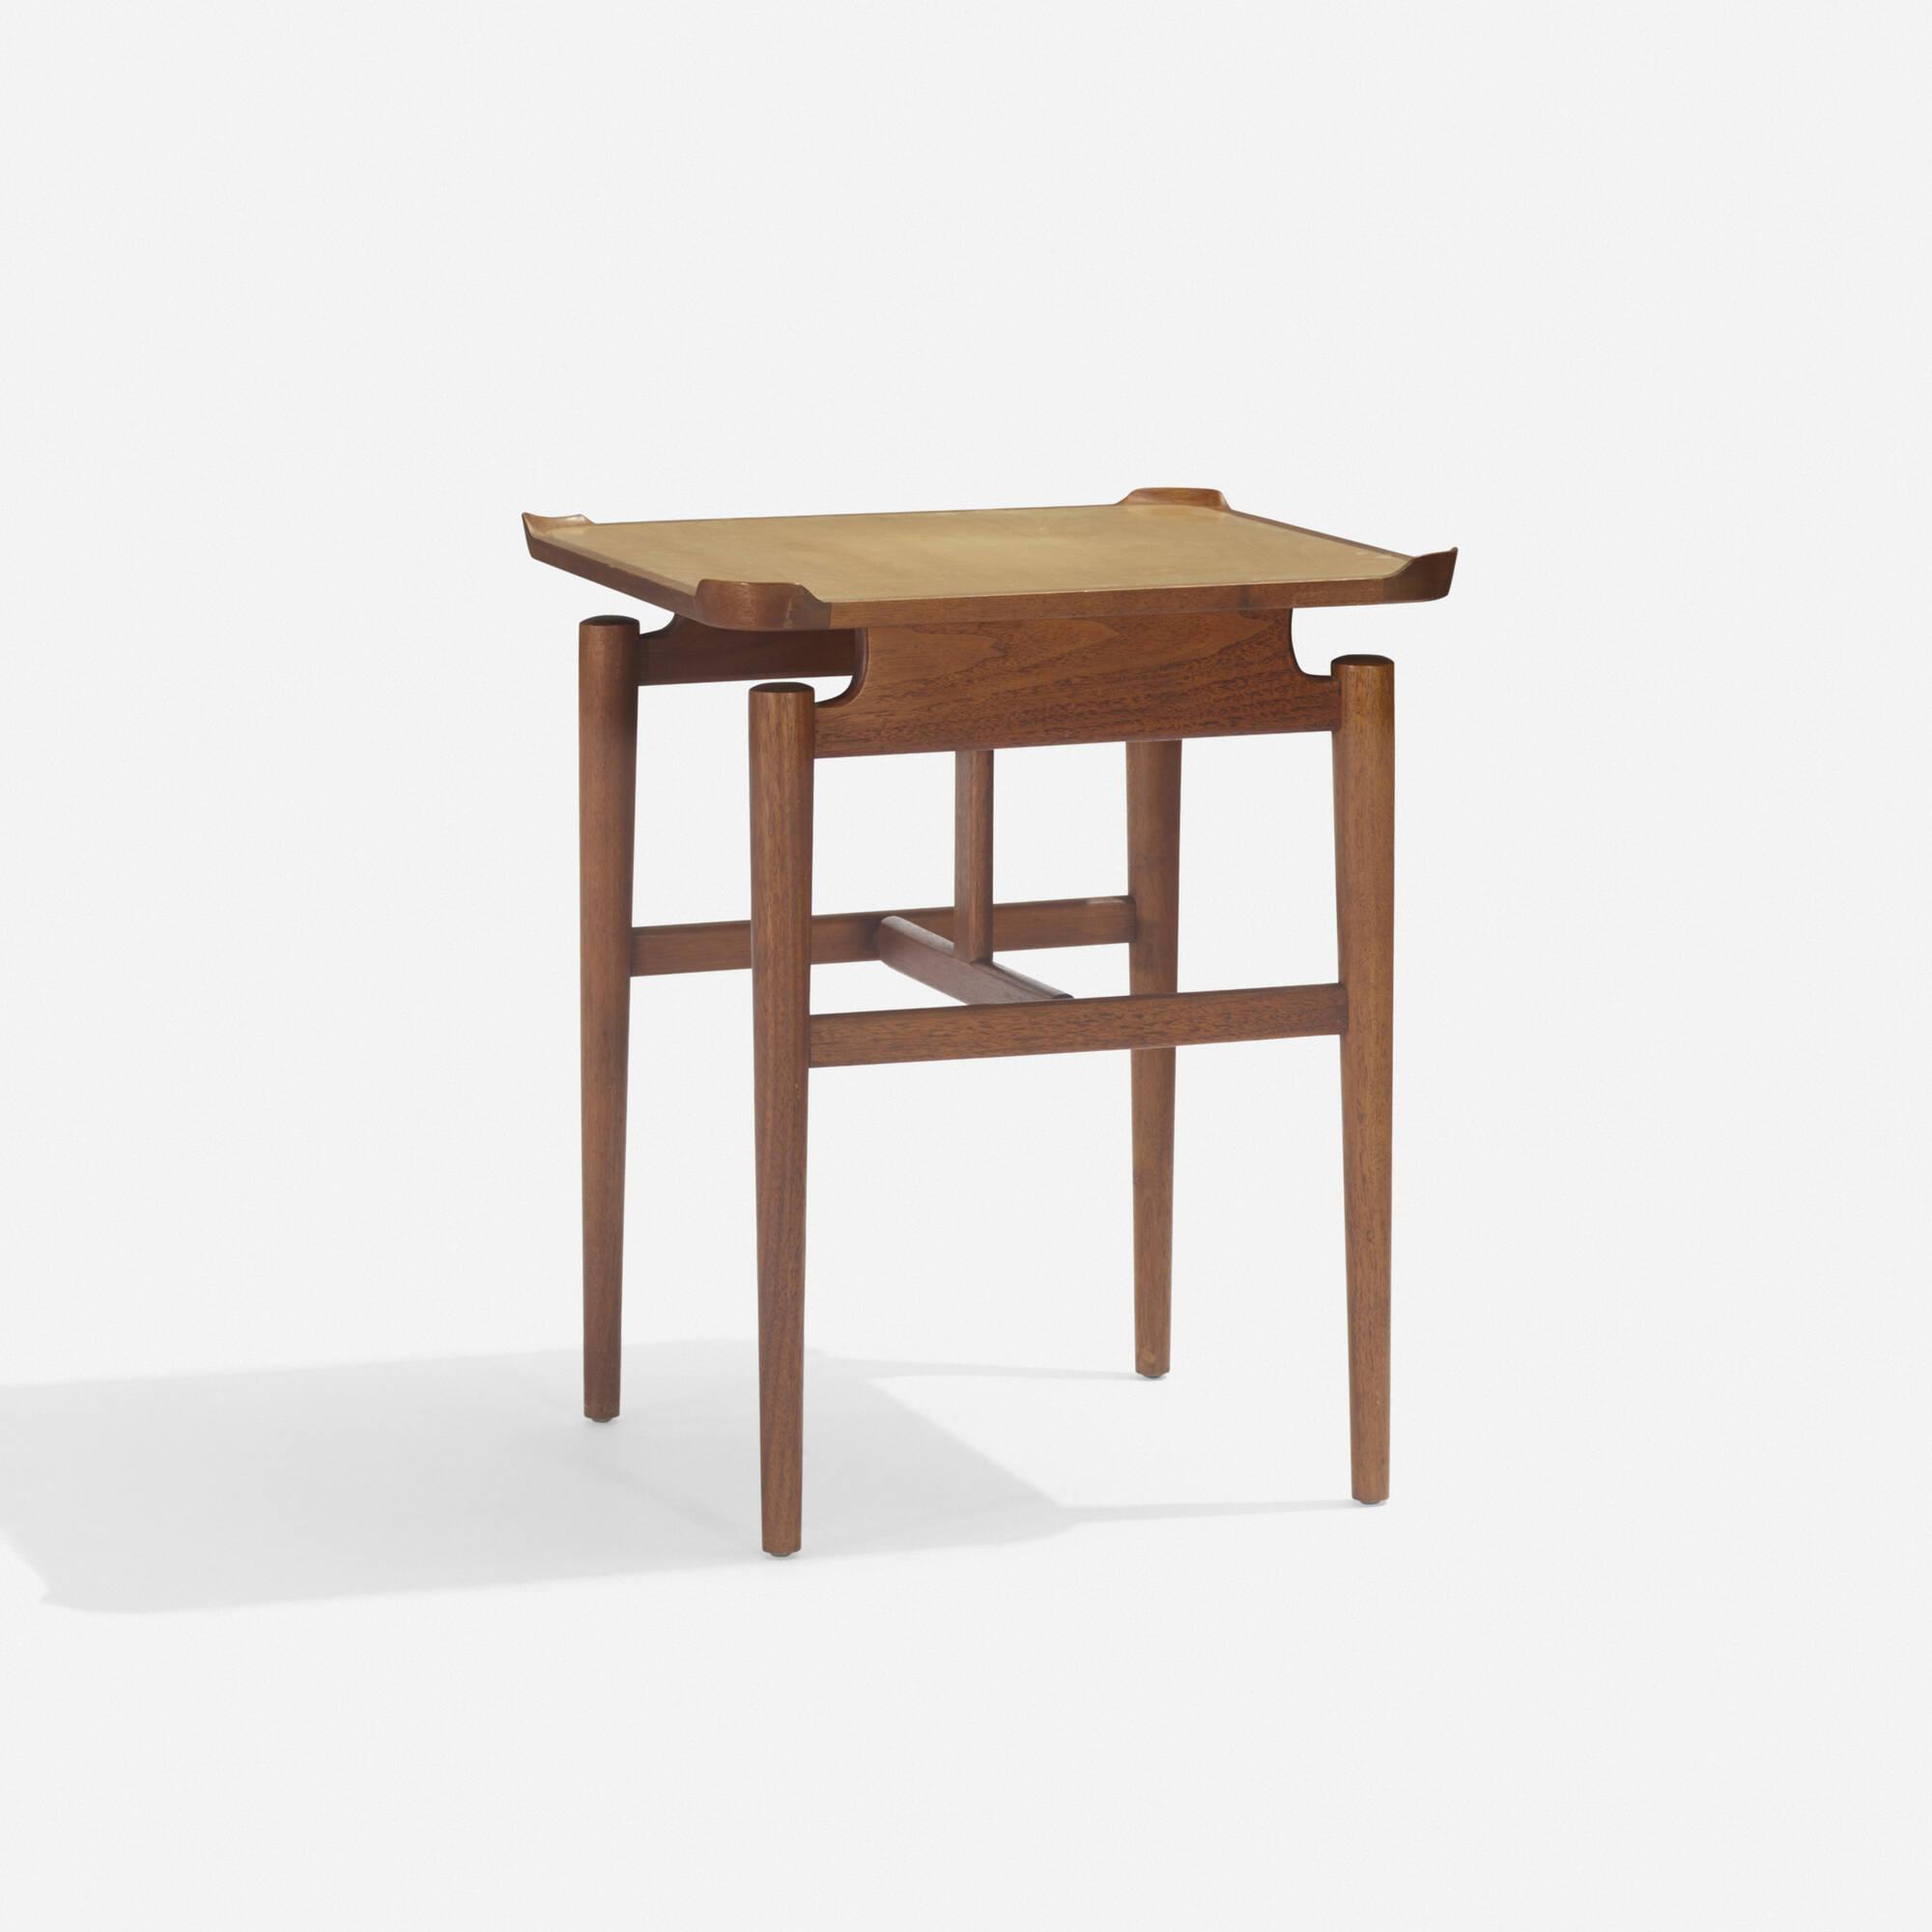 138: Finn Juhl / occasional table, model 526 (1 of 2)